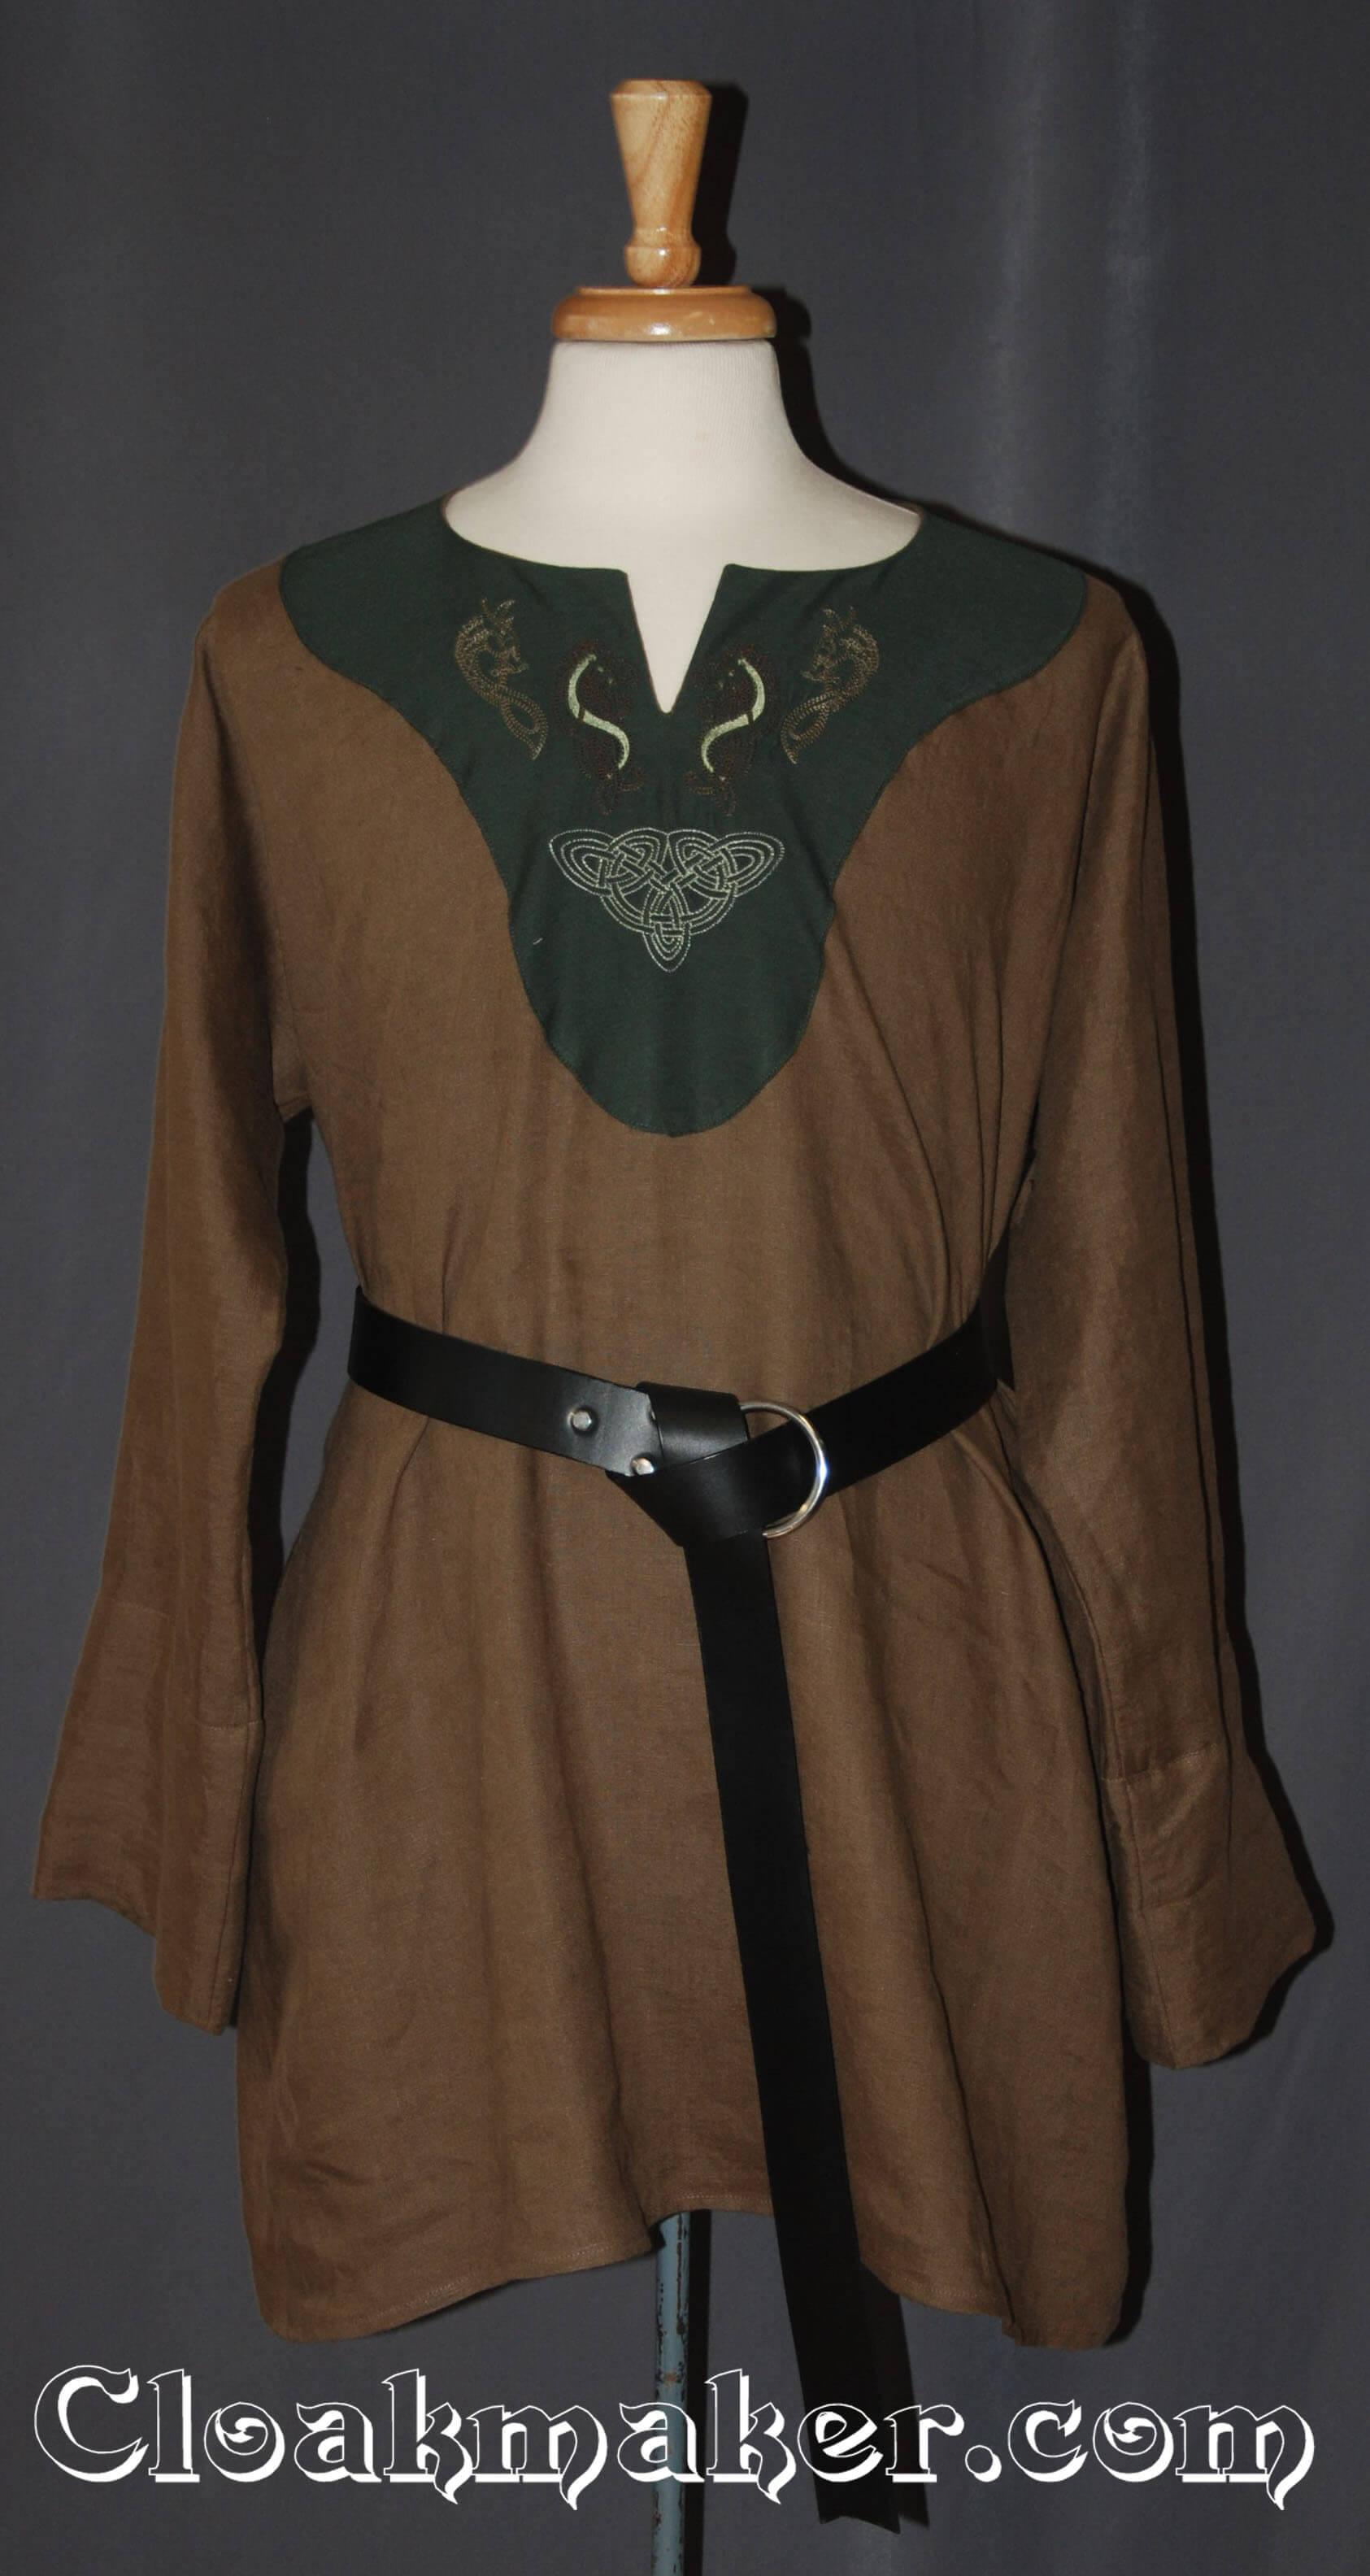 Celtic knot tunic in green cotton bnhe5GAv8x